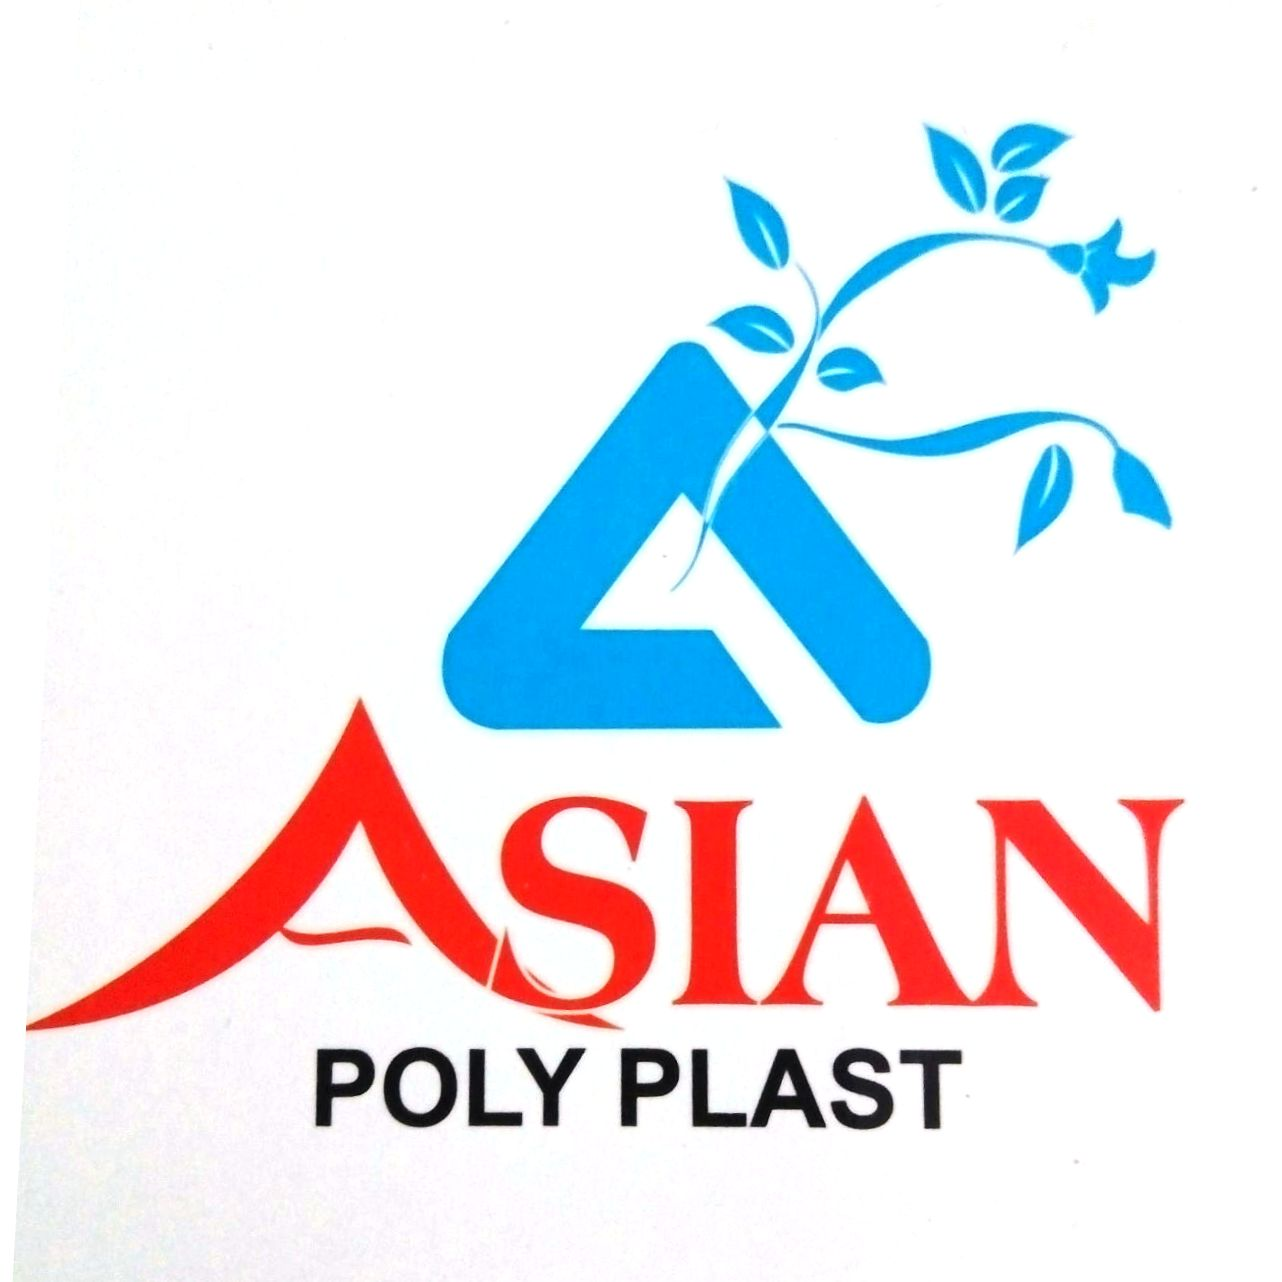 Asian Polyplast logo